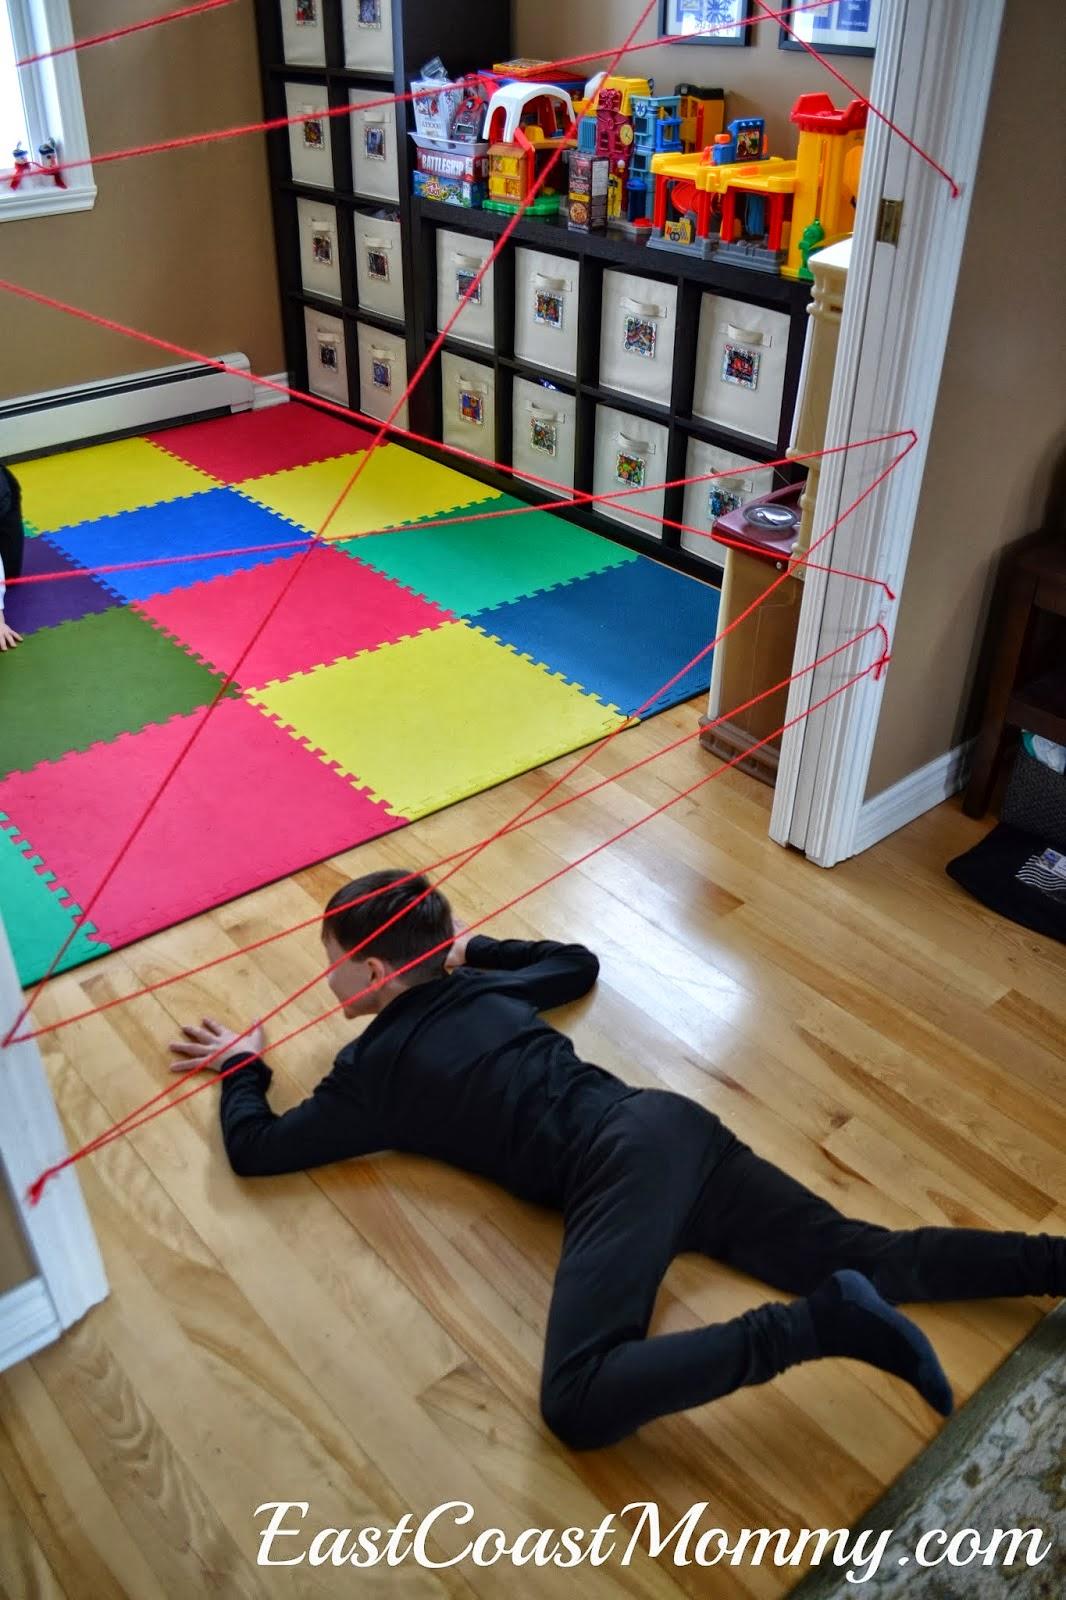 east coast mommy the ultimate diy spy party. Black Bedroom Furniture Sets. Home Design Ideas